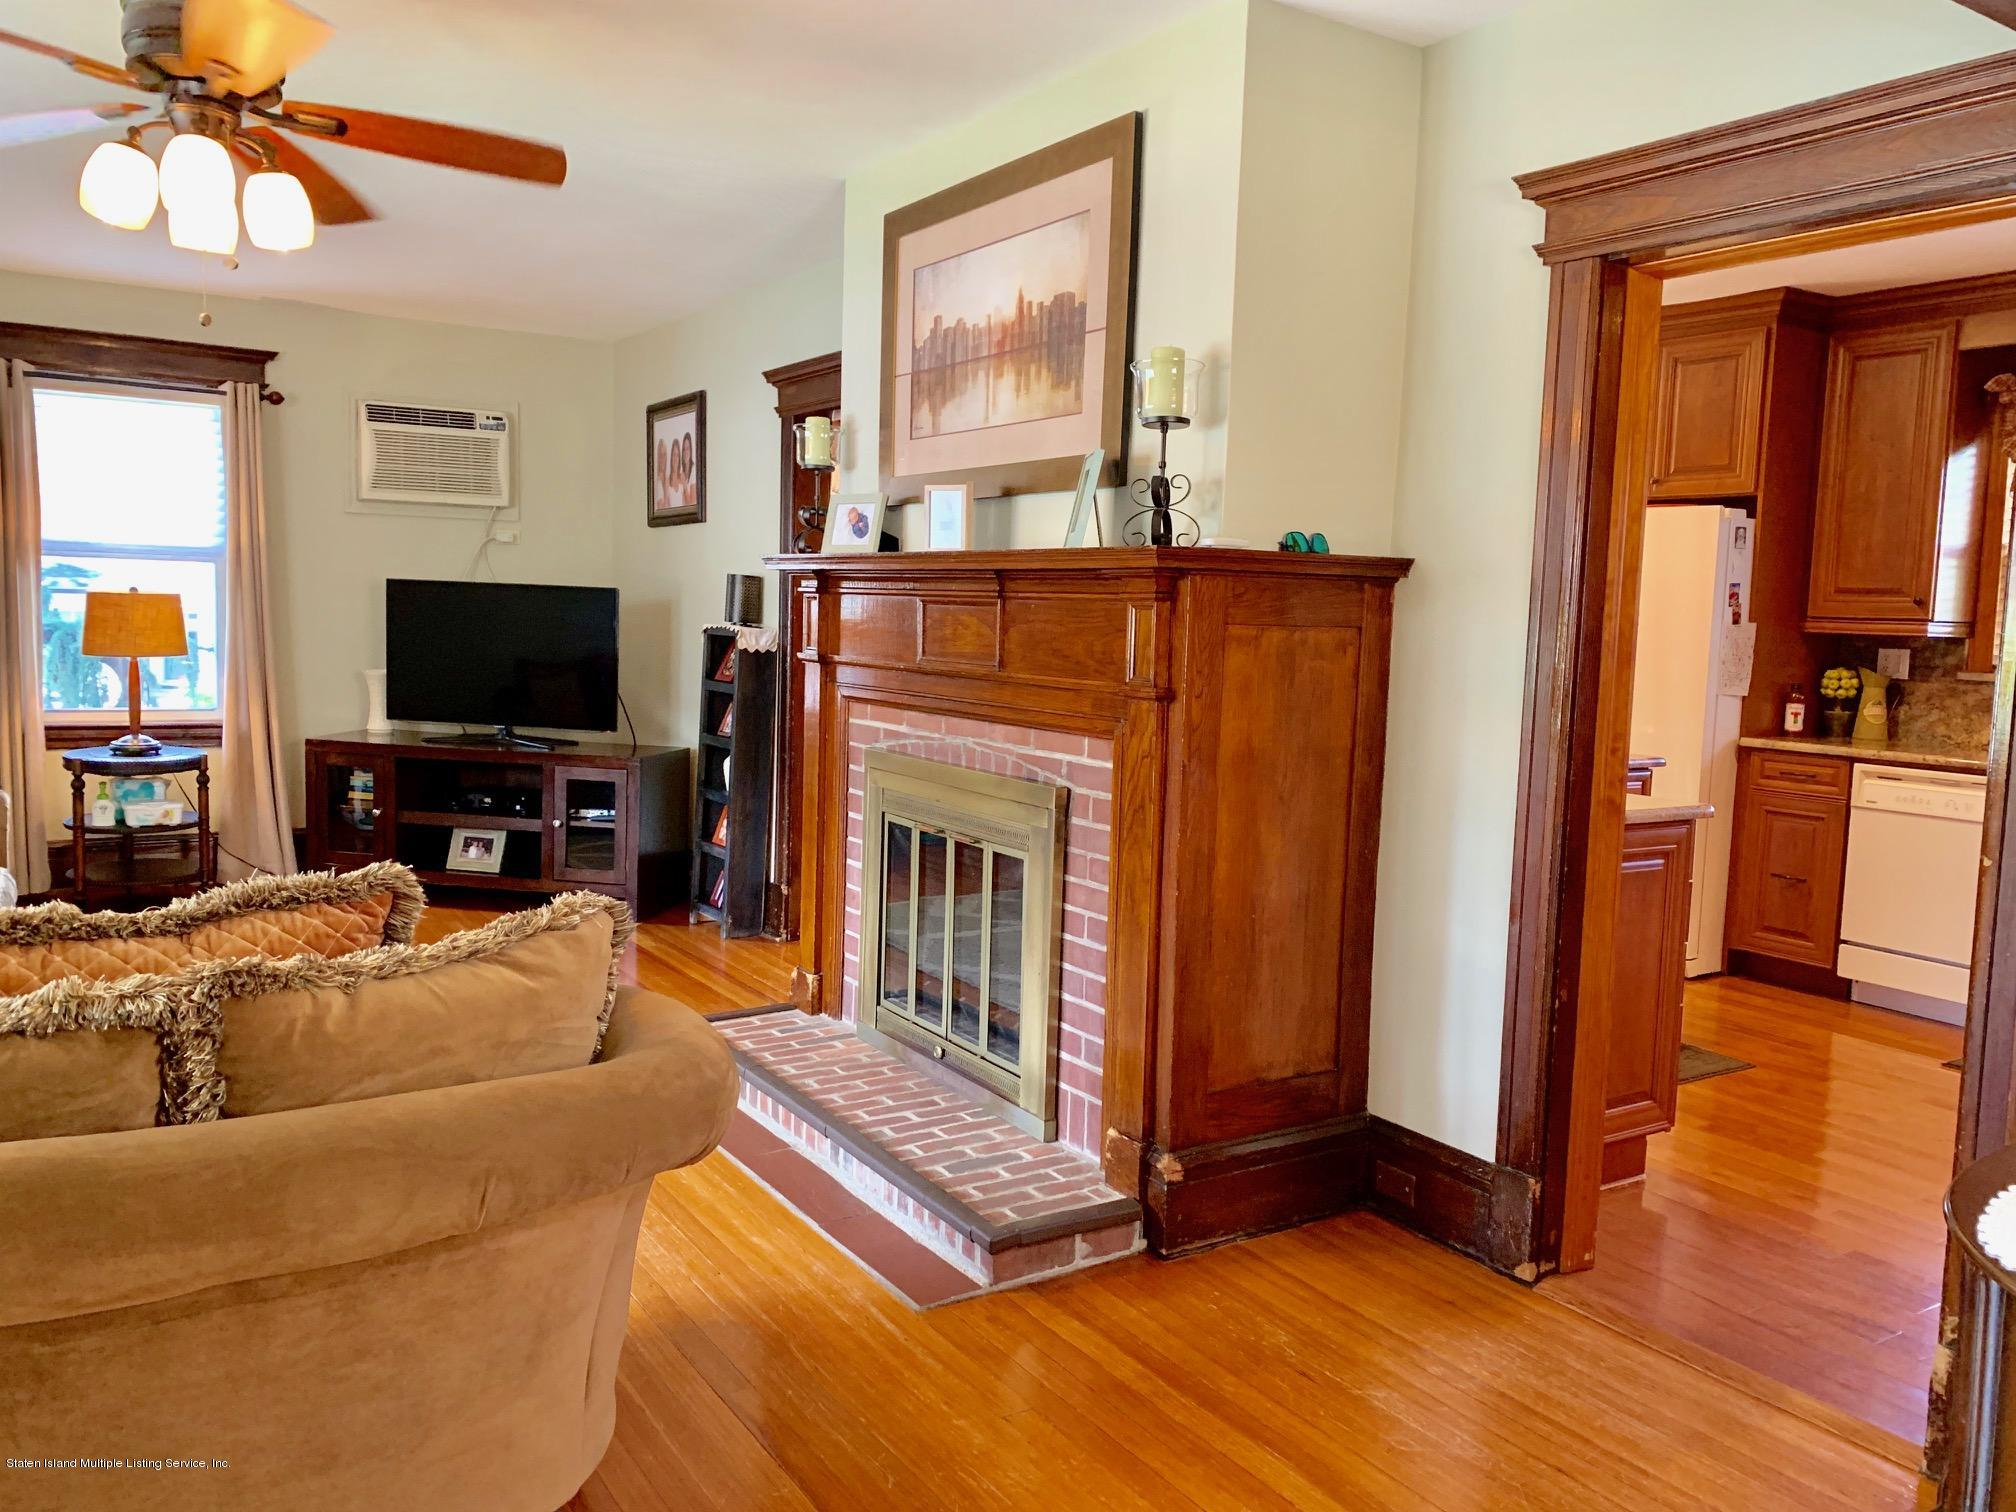 Single Family - Detached 195 Fairview Avenue  Staten Island, NY 10314, MLS-1132423-5